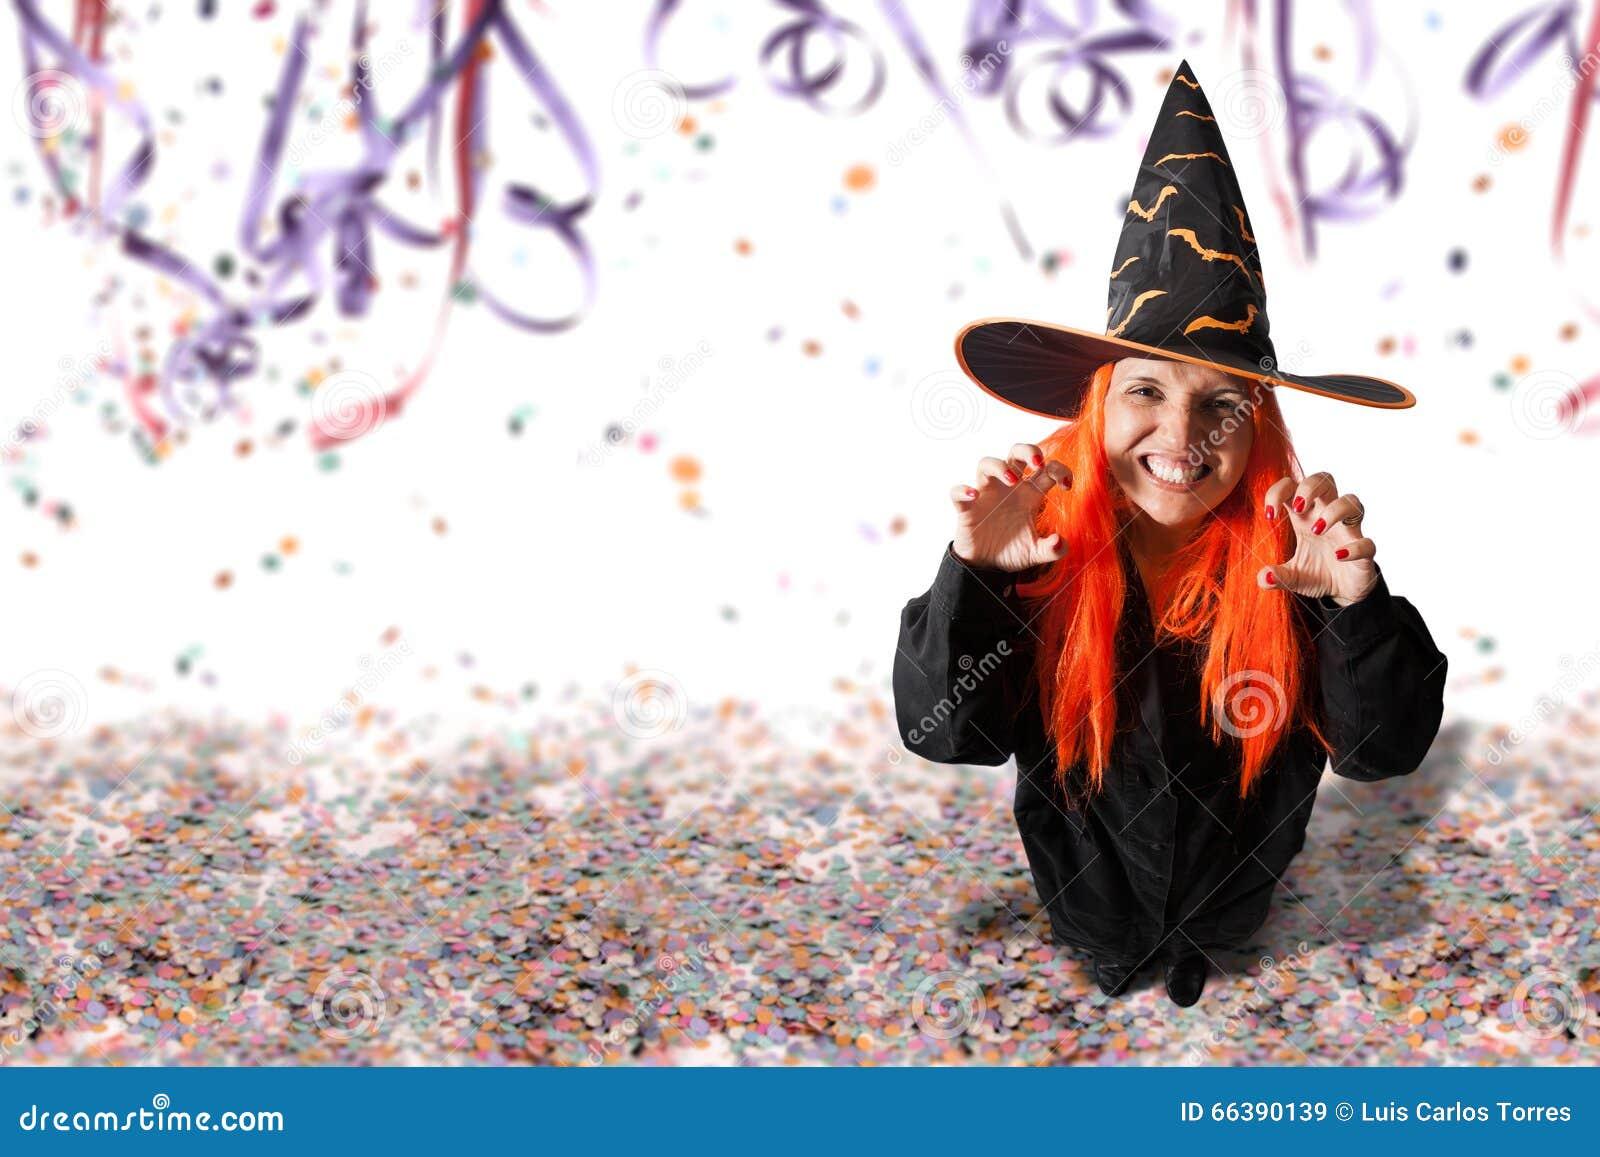 Carnaval ou Halloween